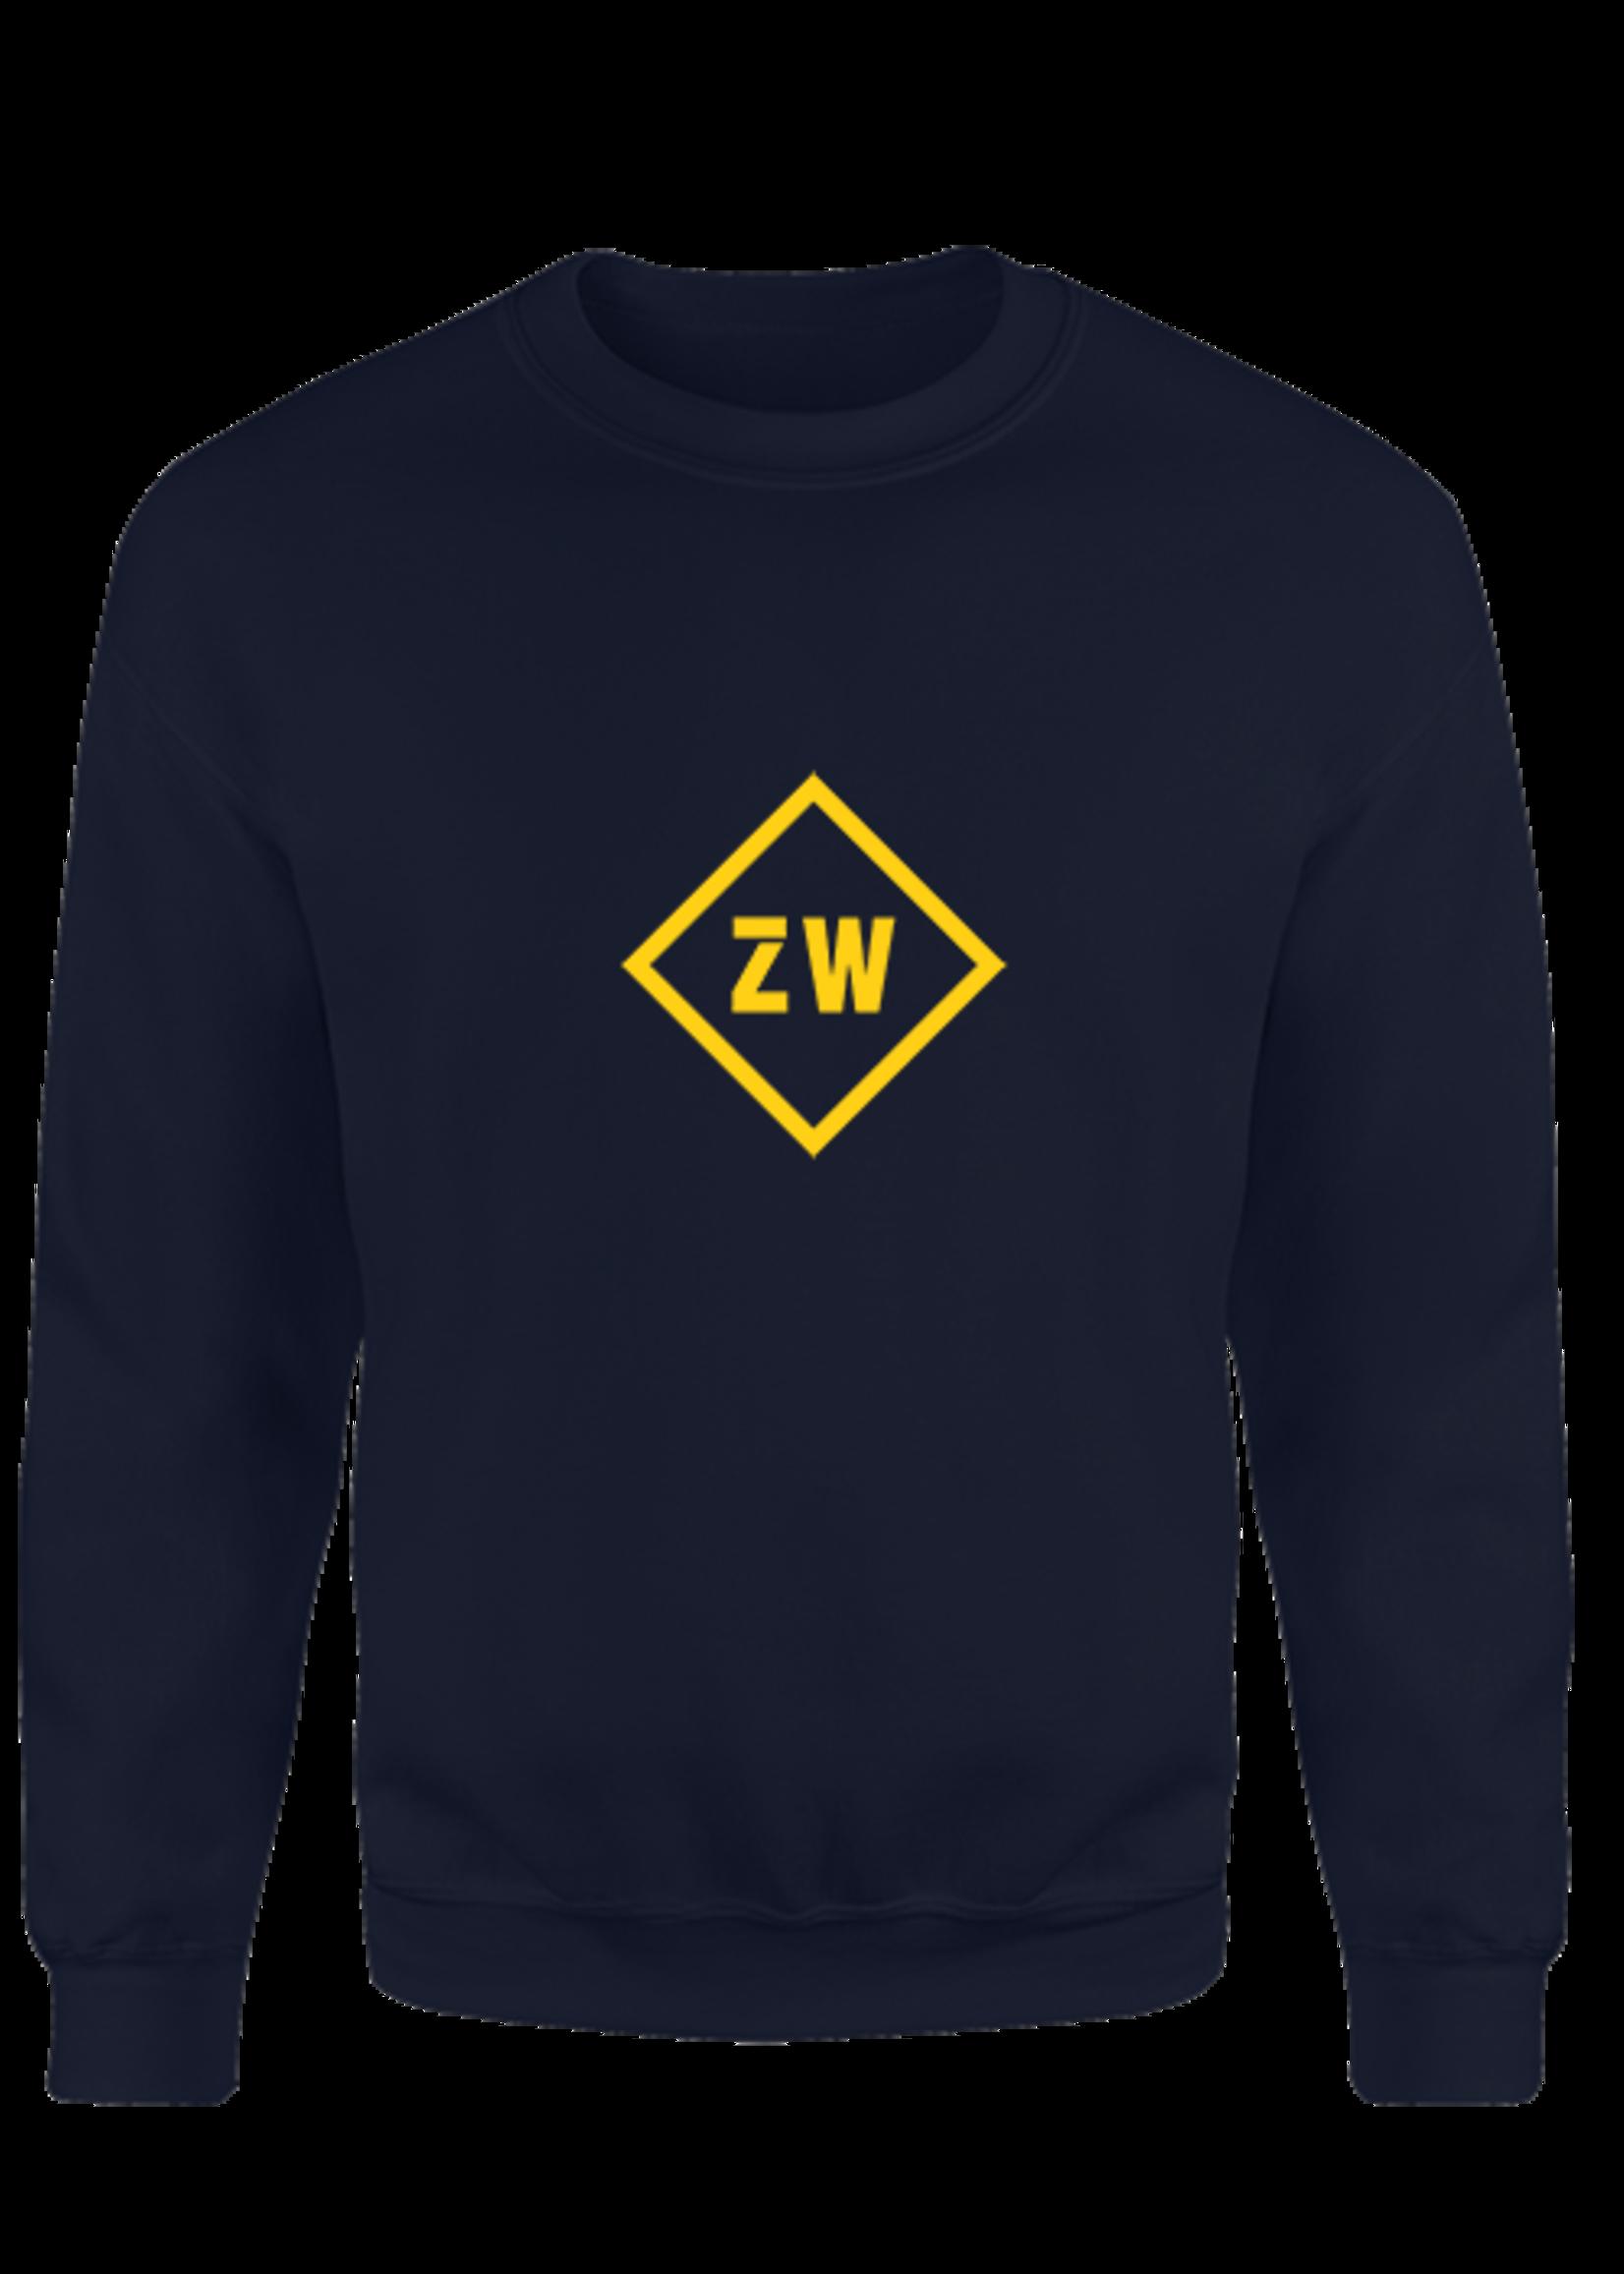 Rebel & Dutch ZwartWit sweater blue yellow